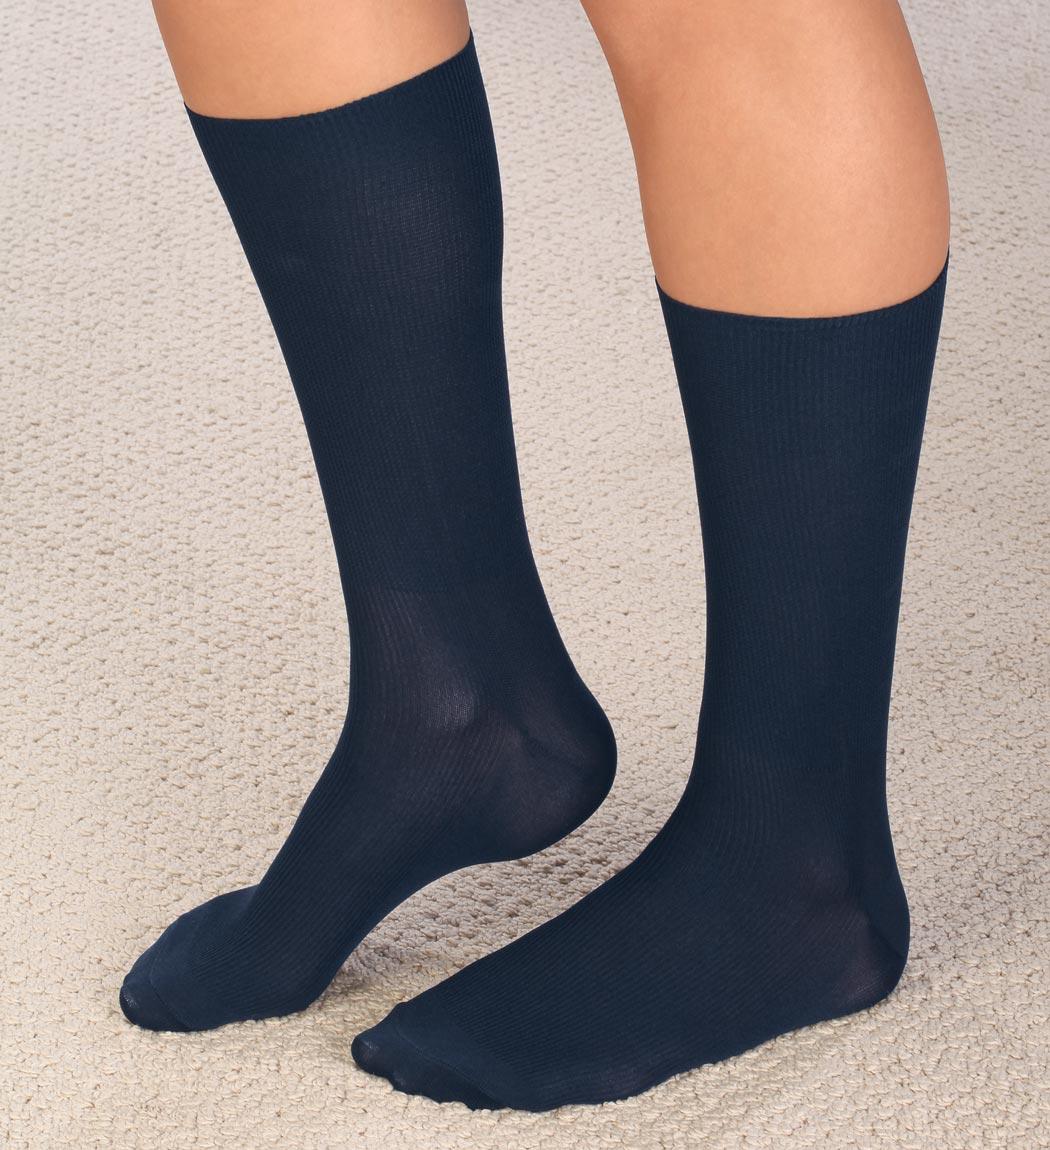 Therapeutic Support Dress Socks